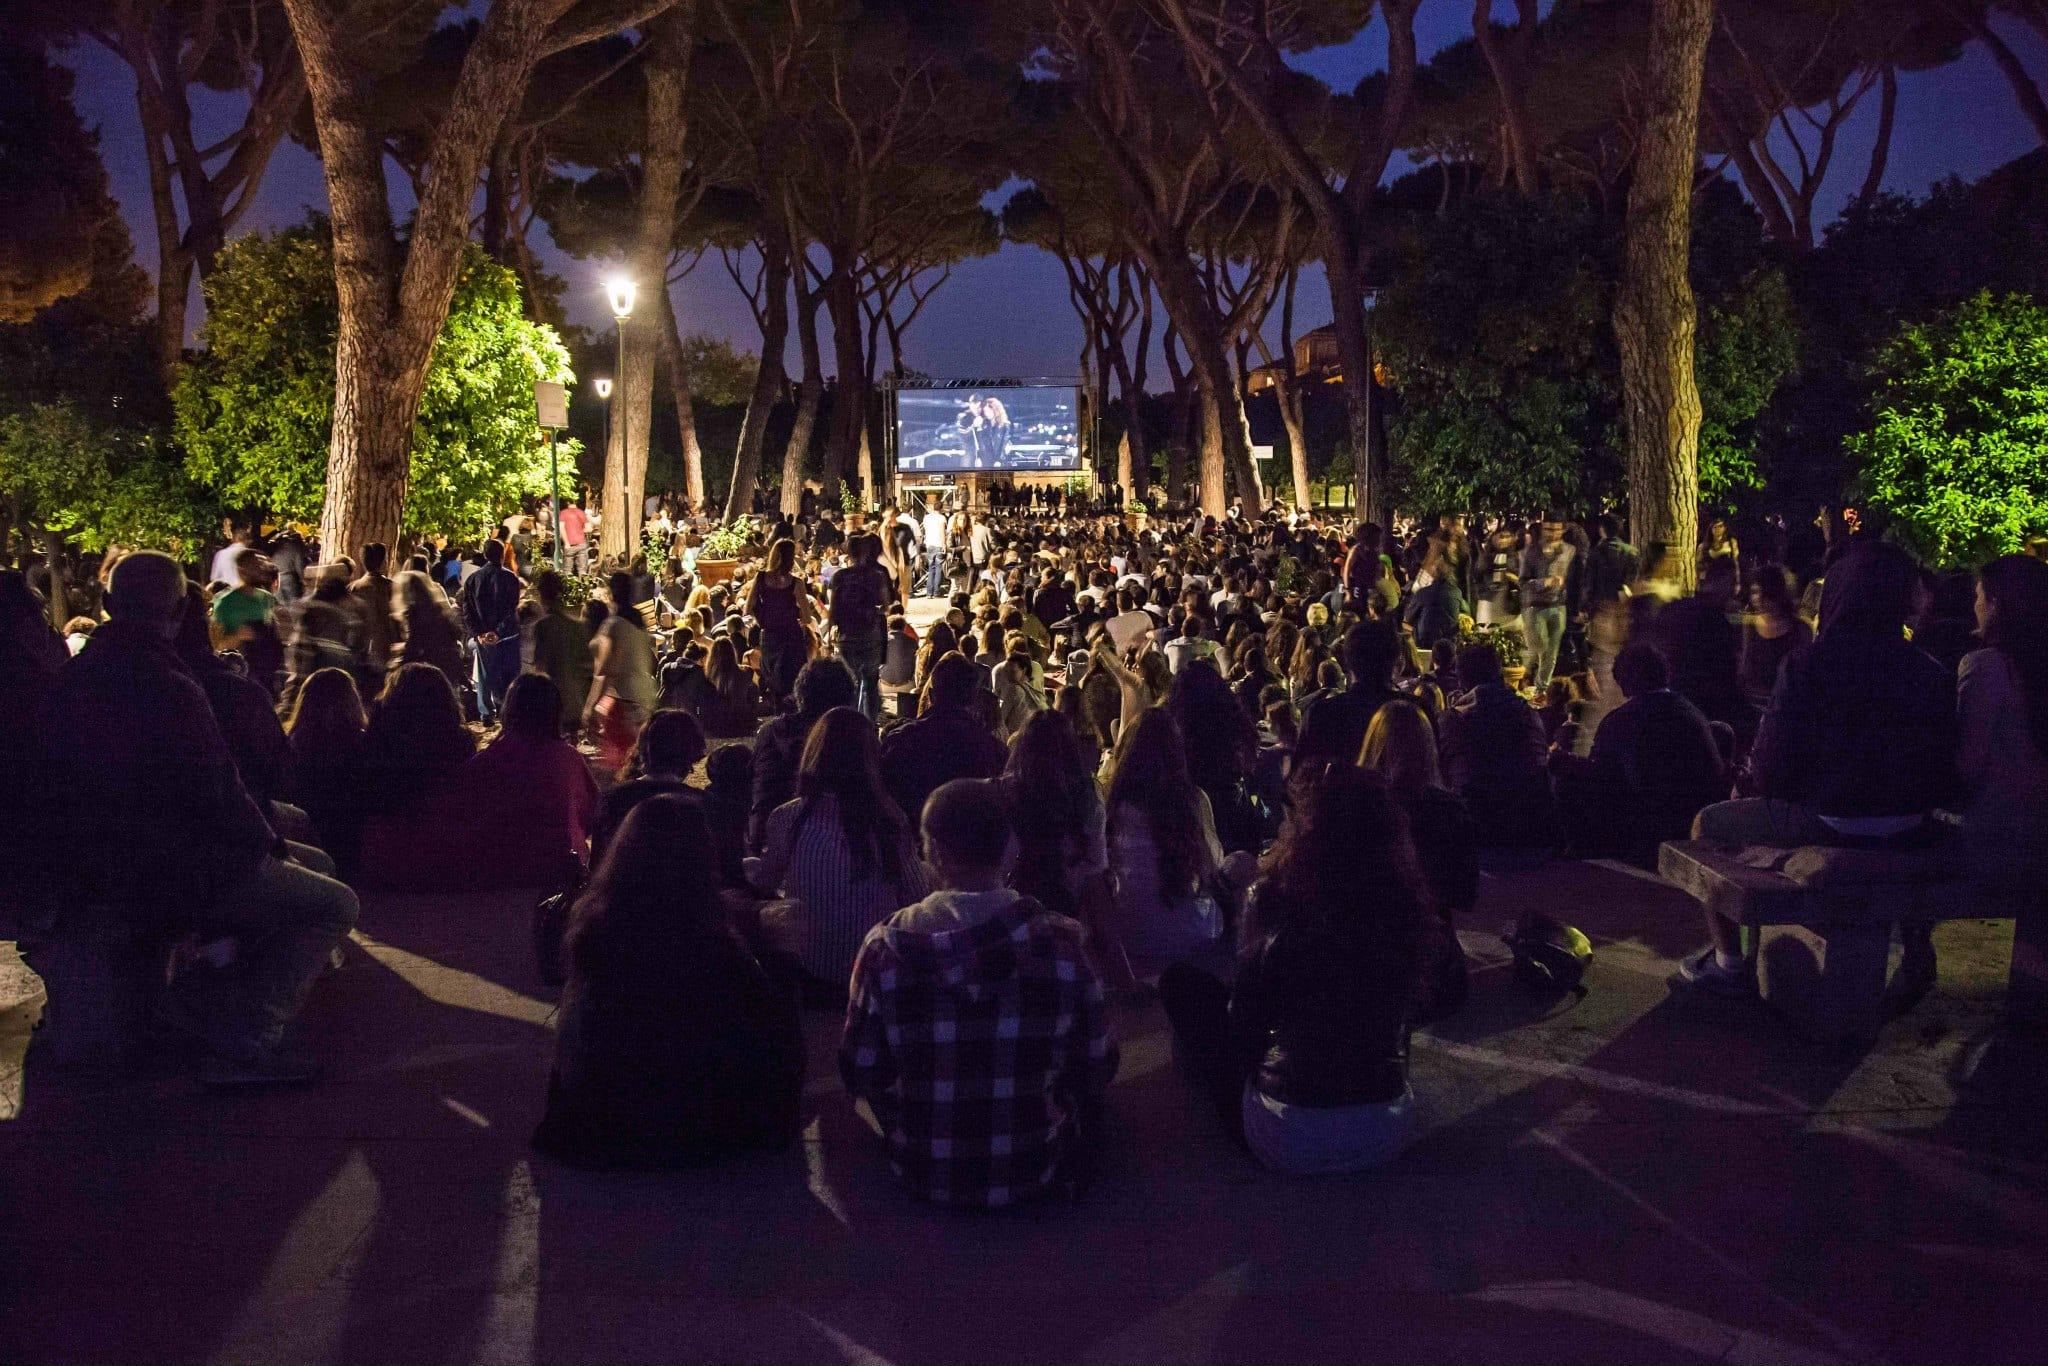 Cinema america roma da trastevere a ostia programma for Programma arredamenti ostia